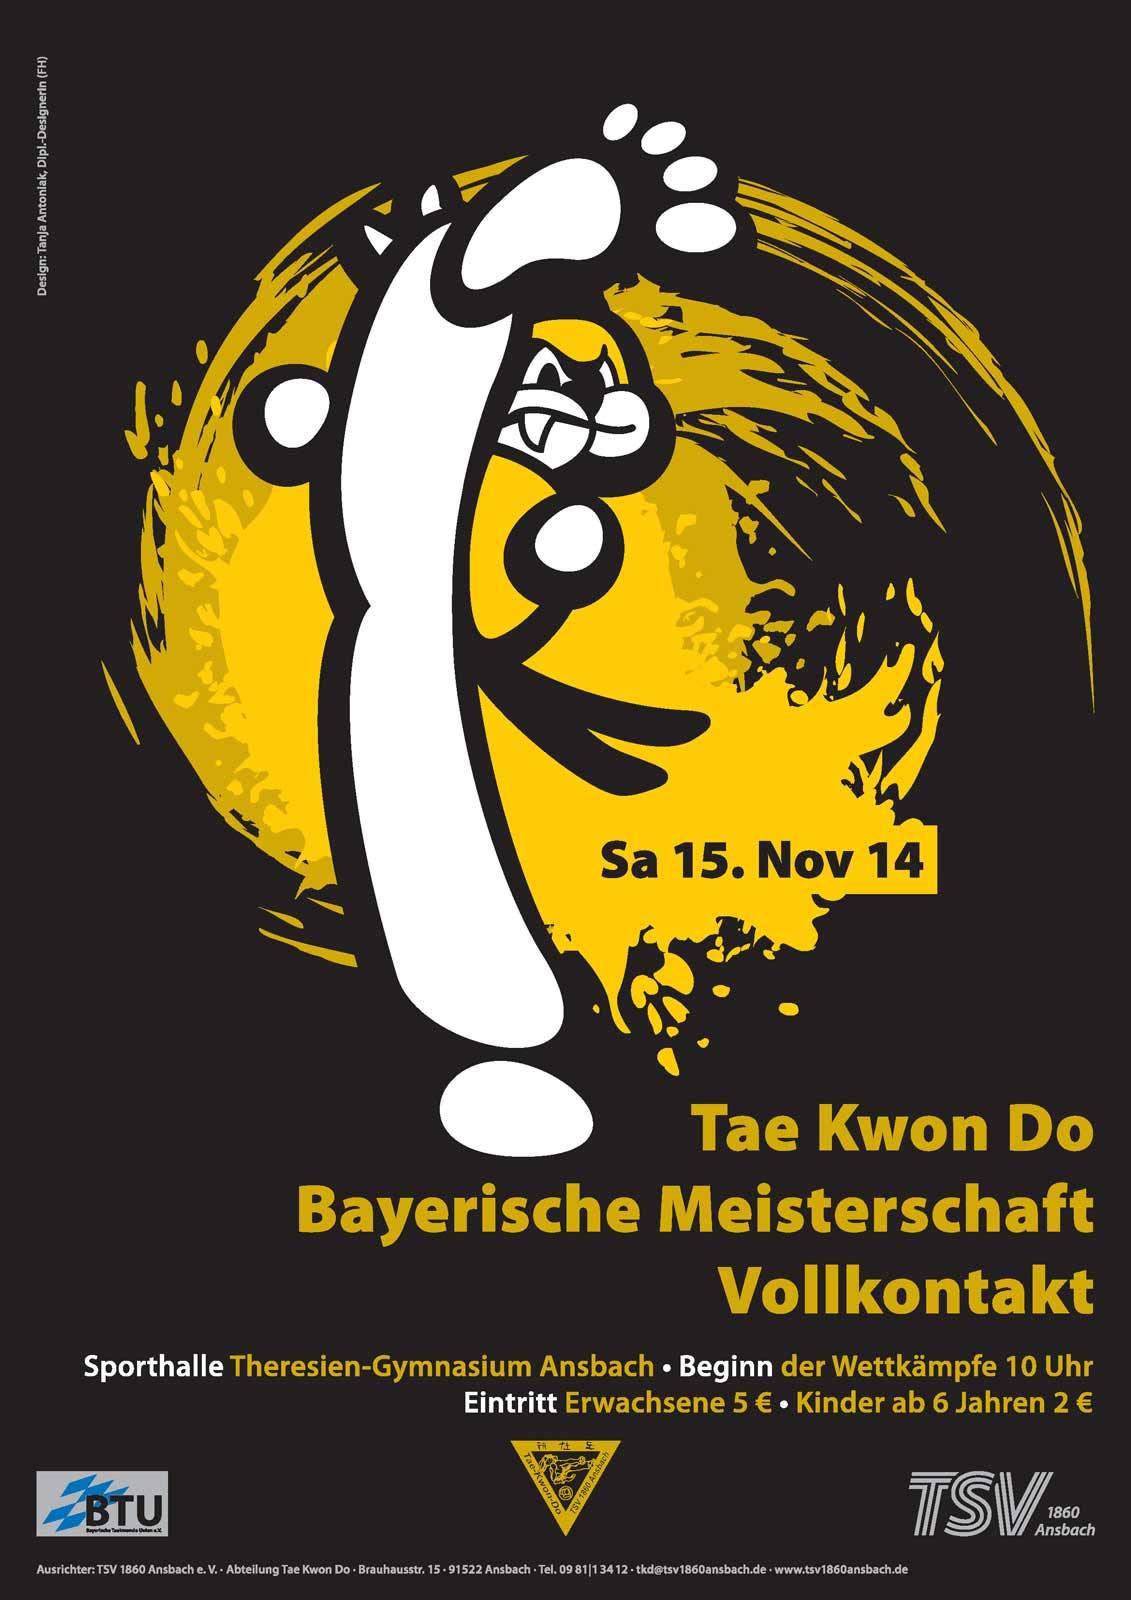 Plakat Bayerische Meisterschaft 2014